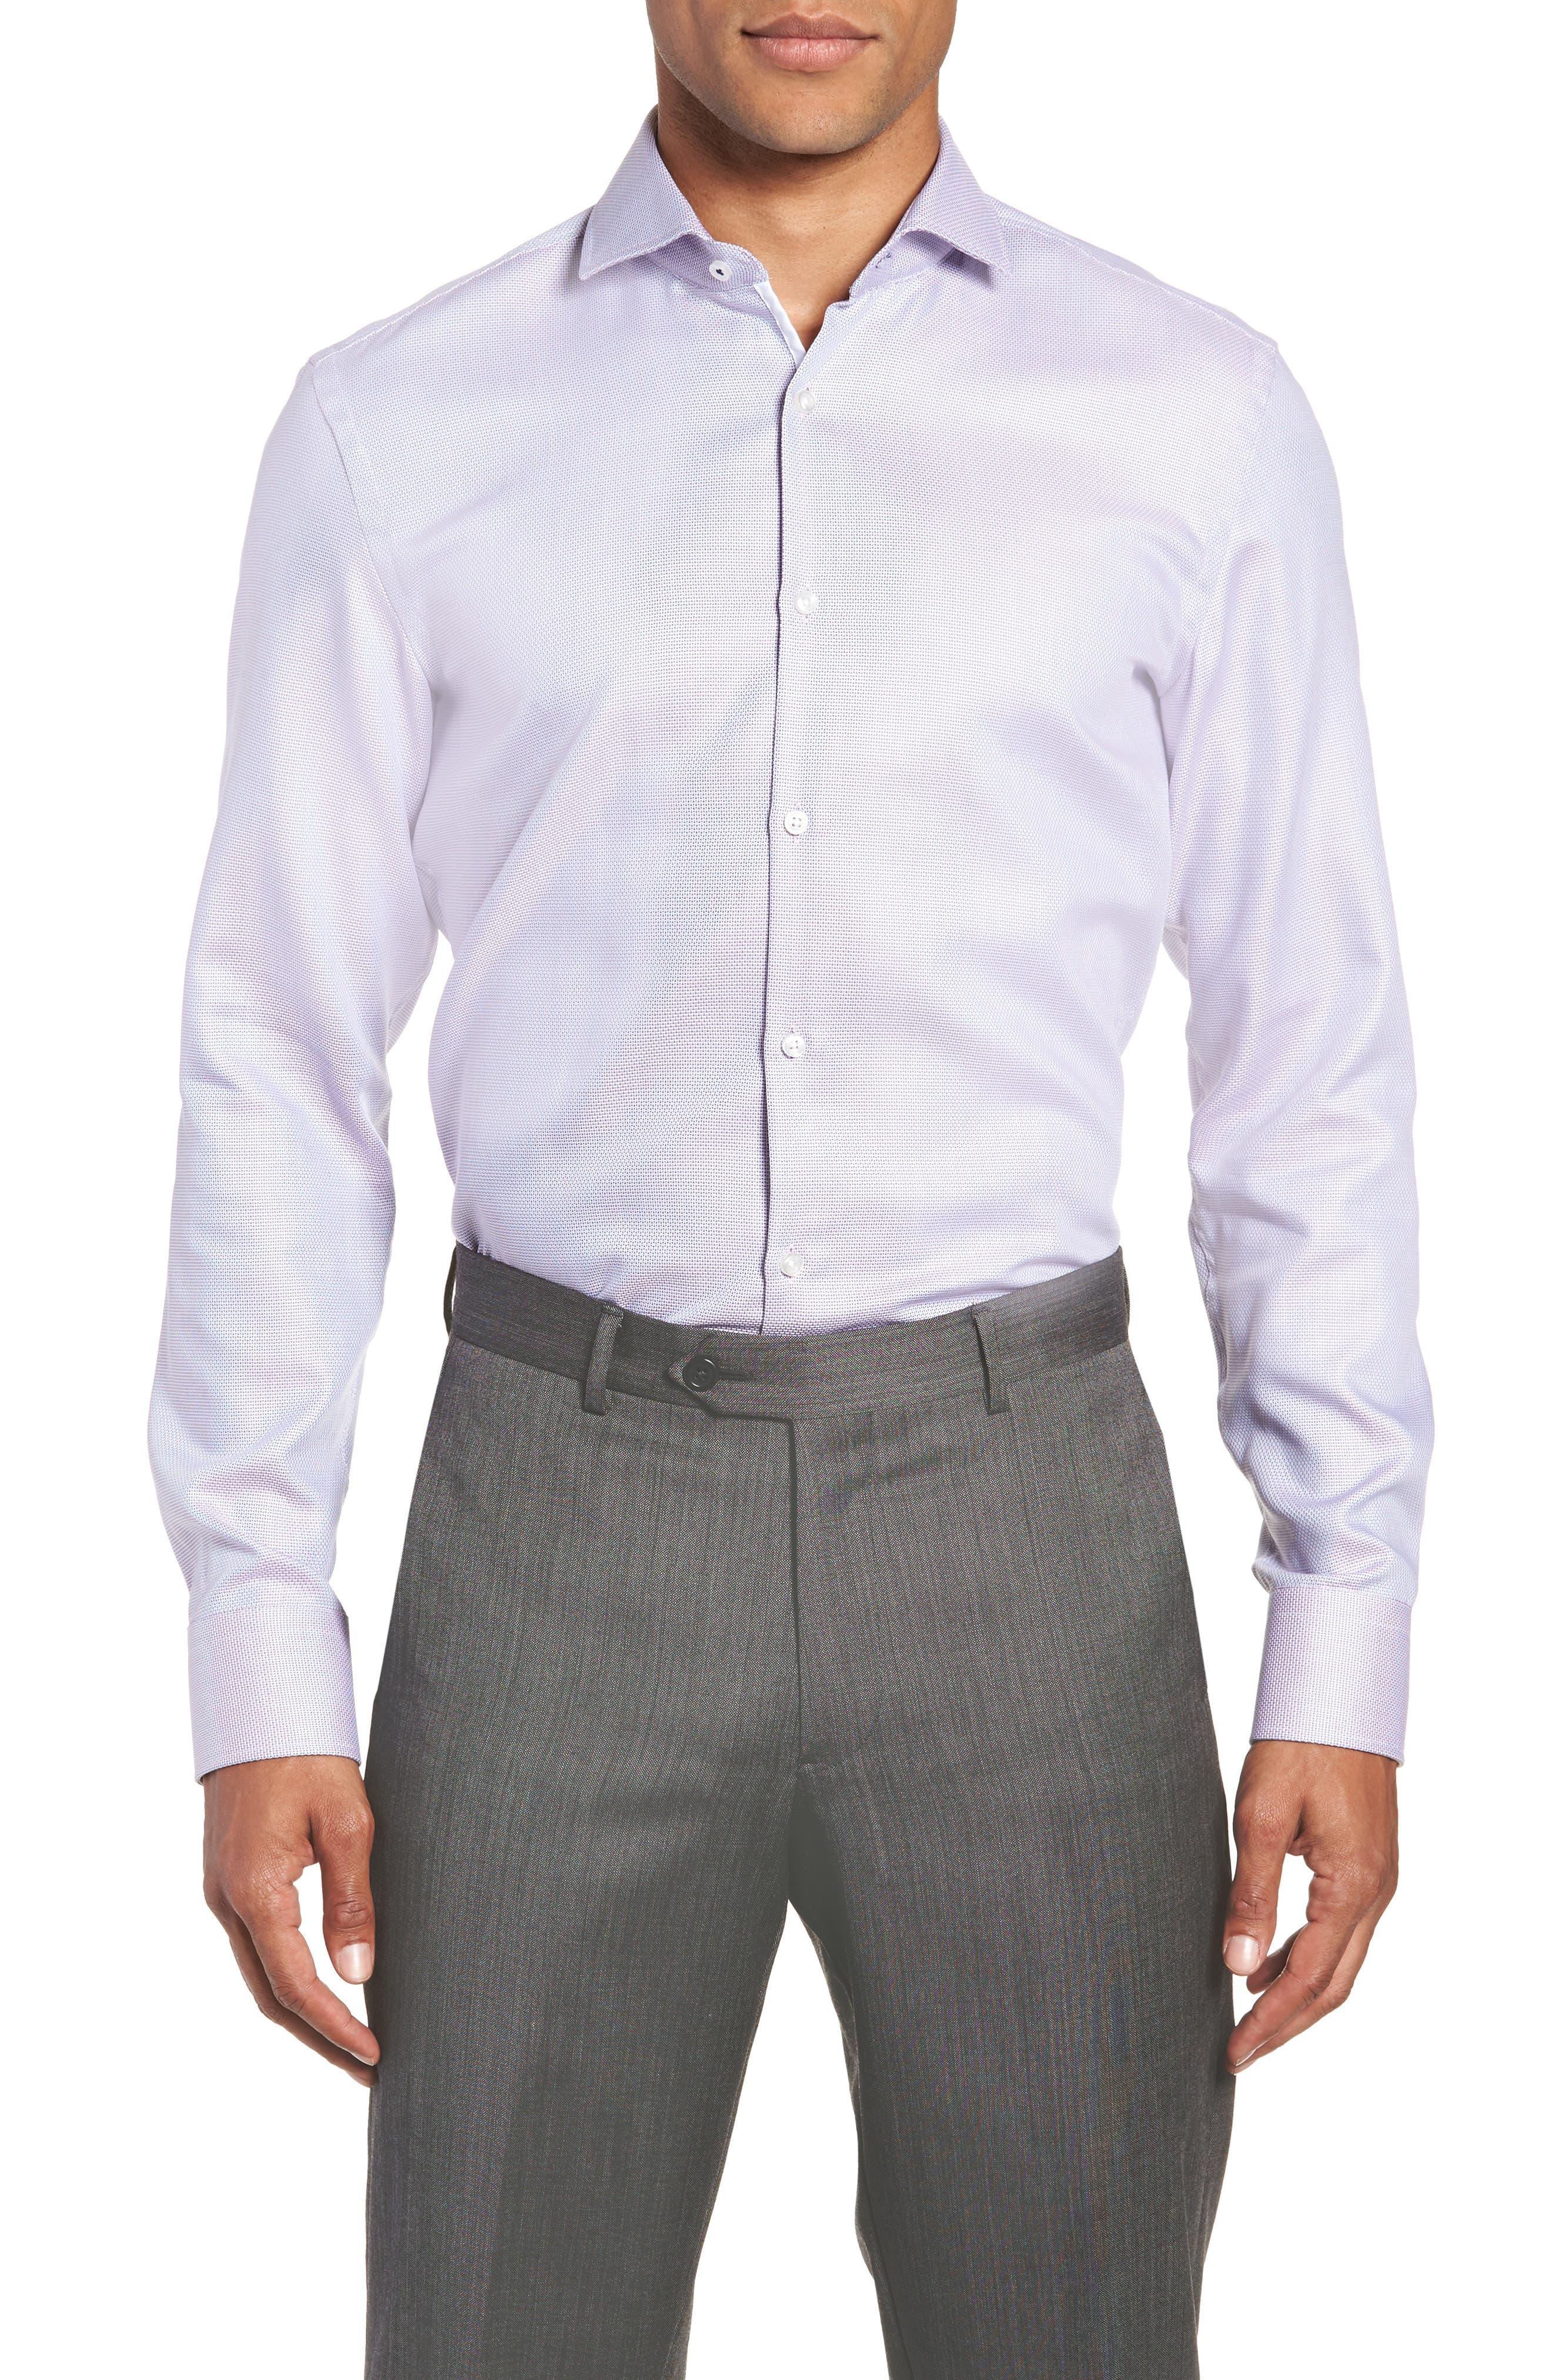 BOSS x Nordstrom Jerrin Slim Fit Solid Dress Shirt, Main, color, LAVENDER